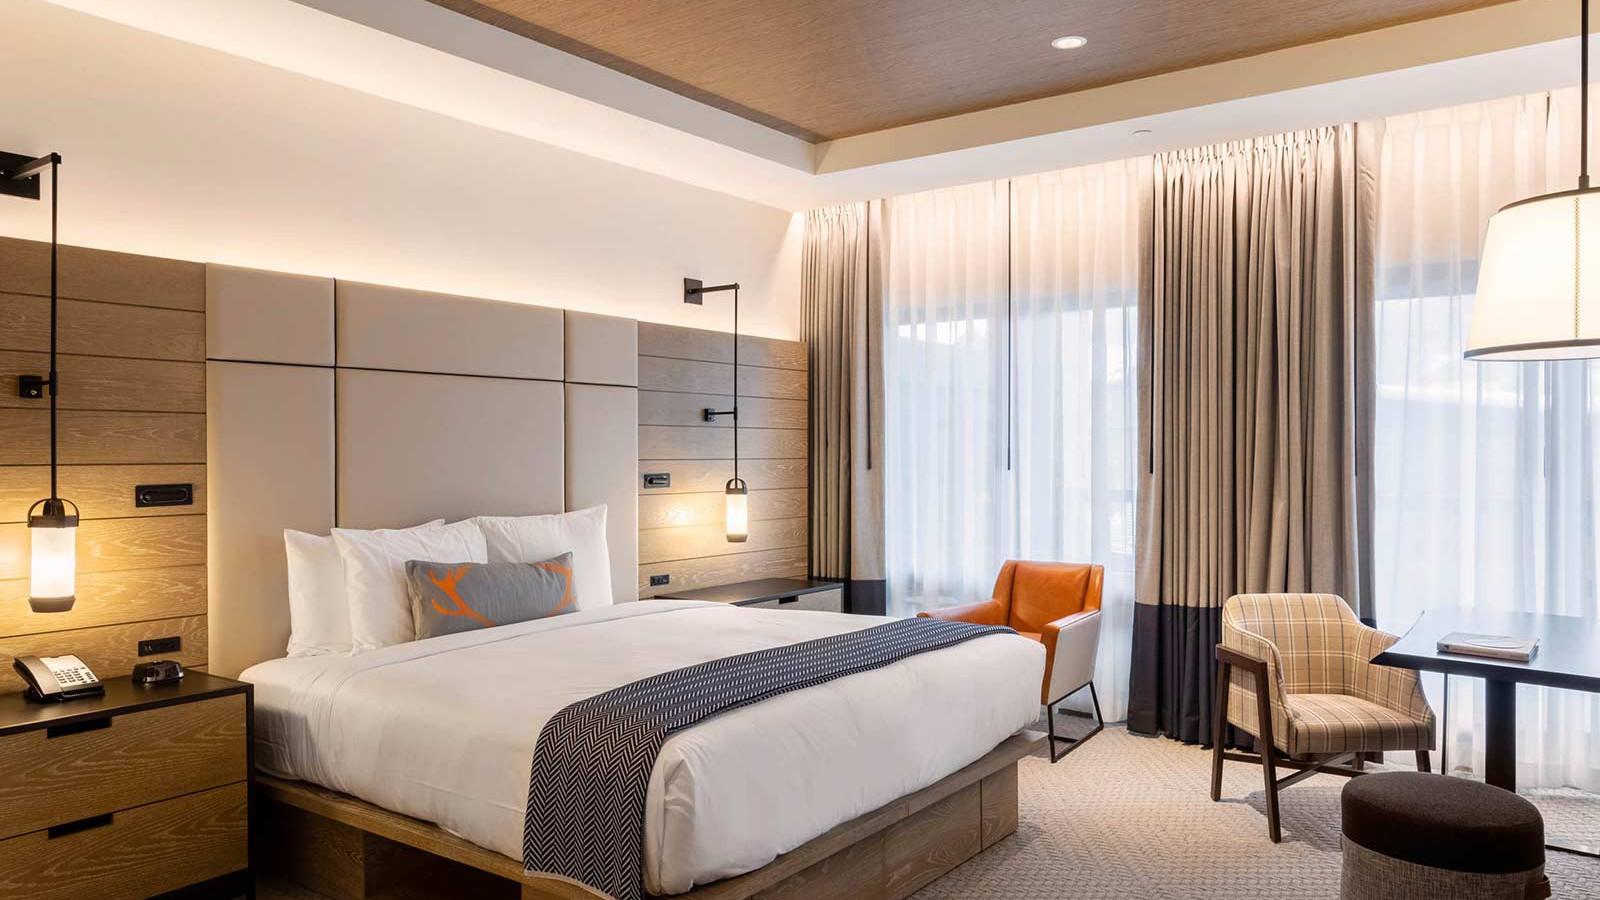 Limelight Snowmass Hotel, Aspen - Terrace Room 2